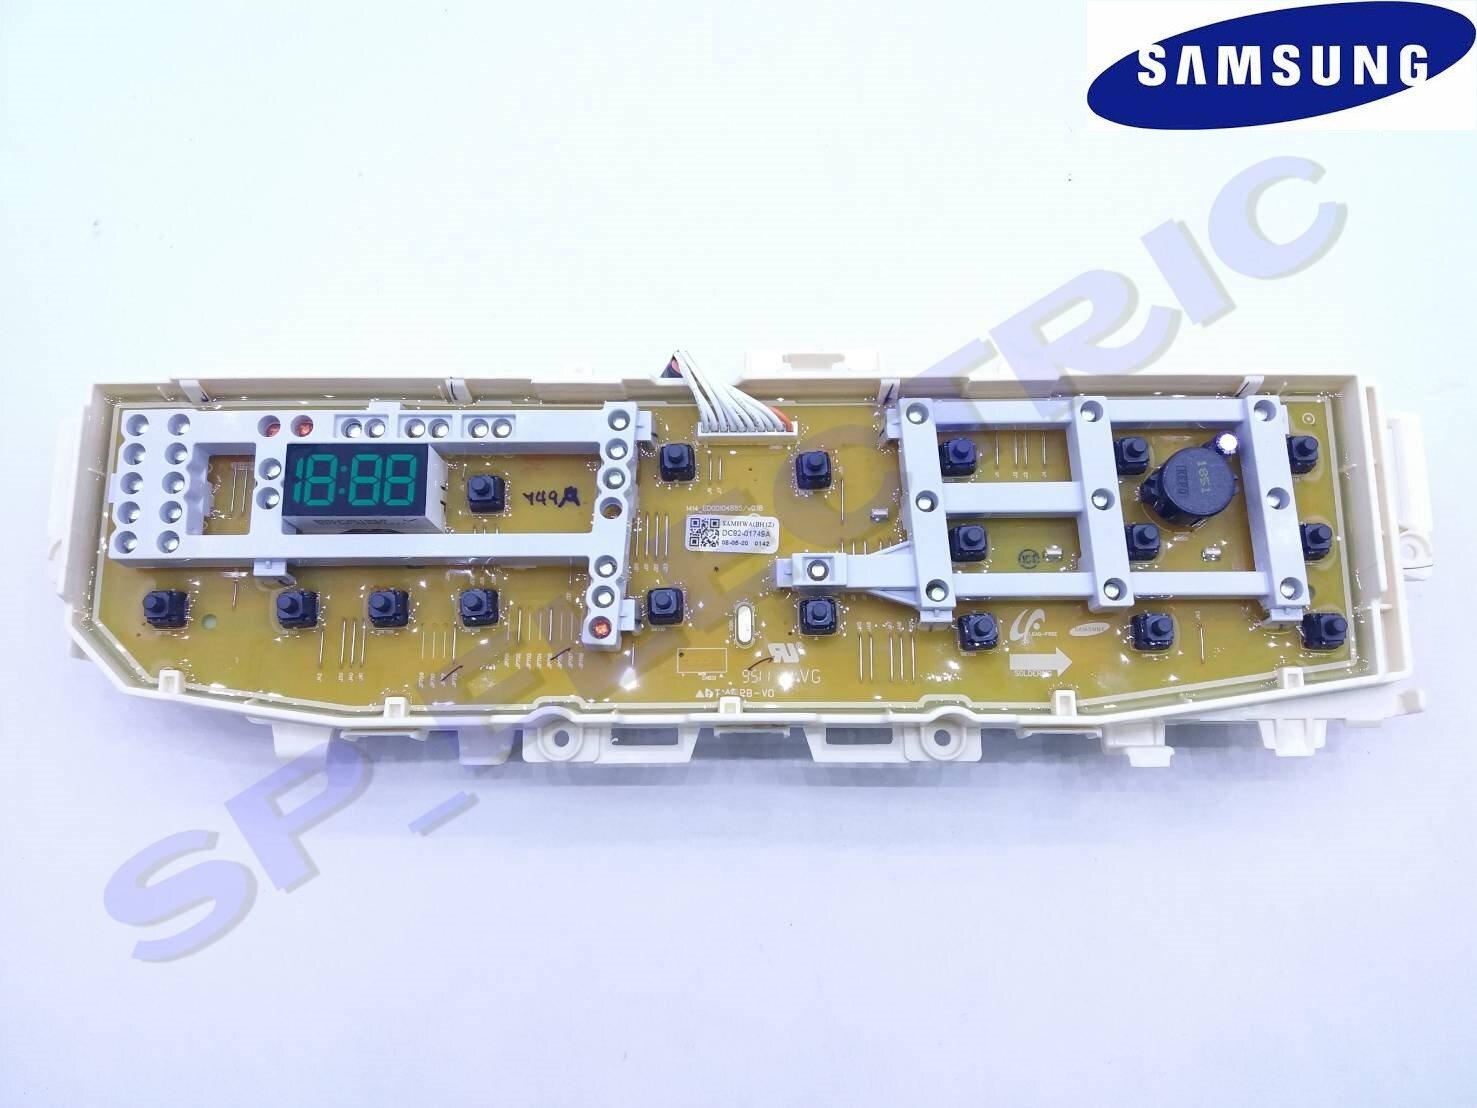 DC92-01747A แผง PCB เครื่องซักผ้า Samsung รุ่น WA16J6750SP/ST